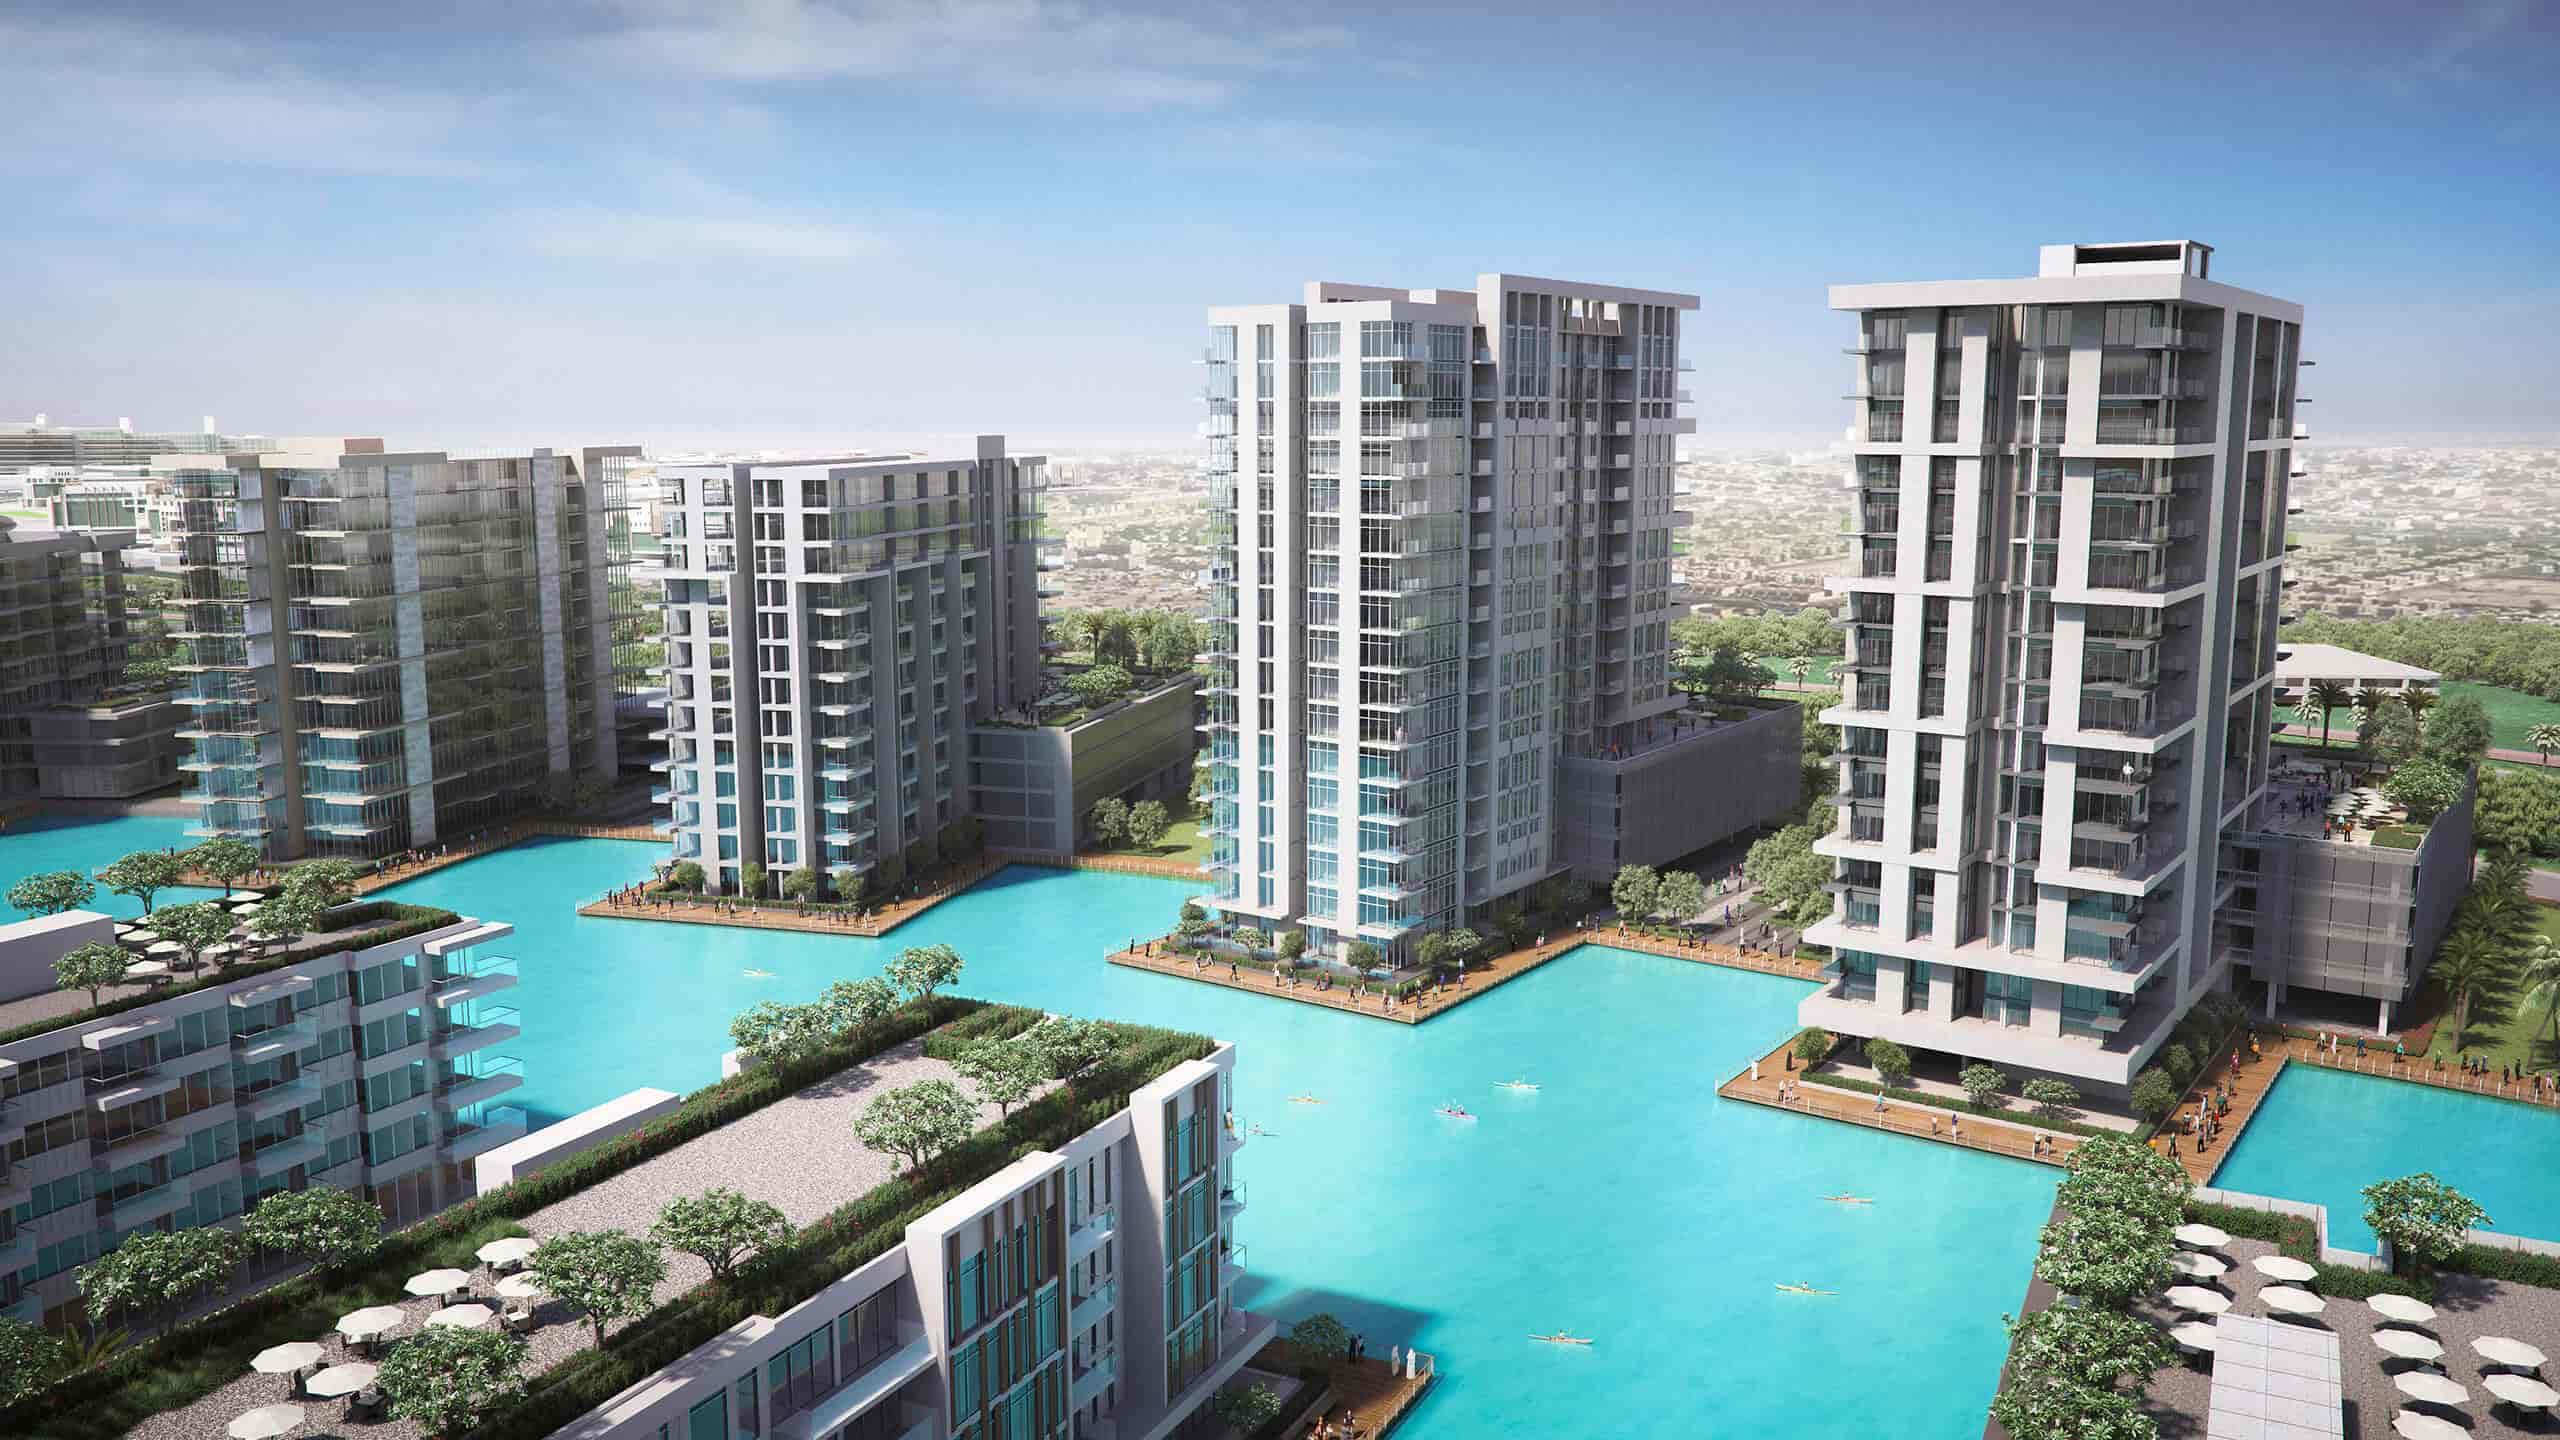 Properties for Sale in Mohammed Bin Rashid Al Maktoum (MBR) City, Dubai